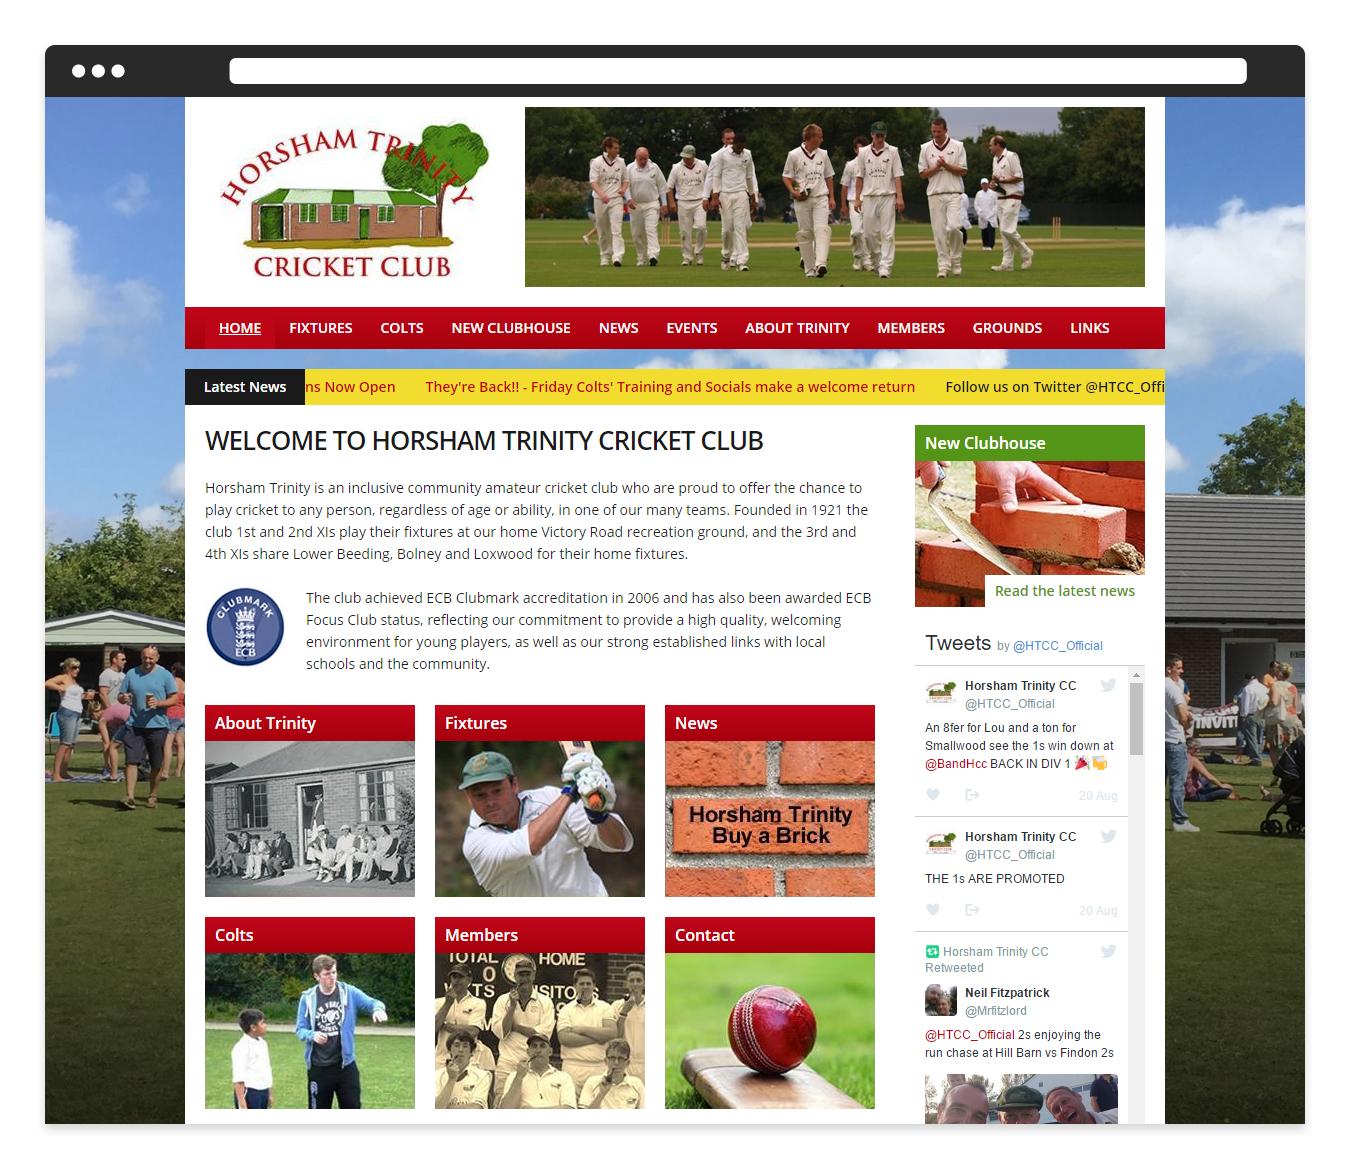 Horsham Trinity Cricket Club: Web Design & Development Case Study